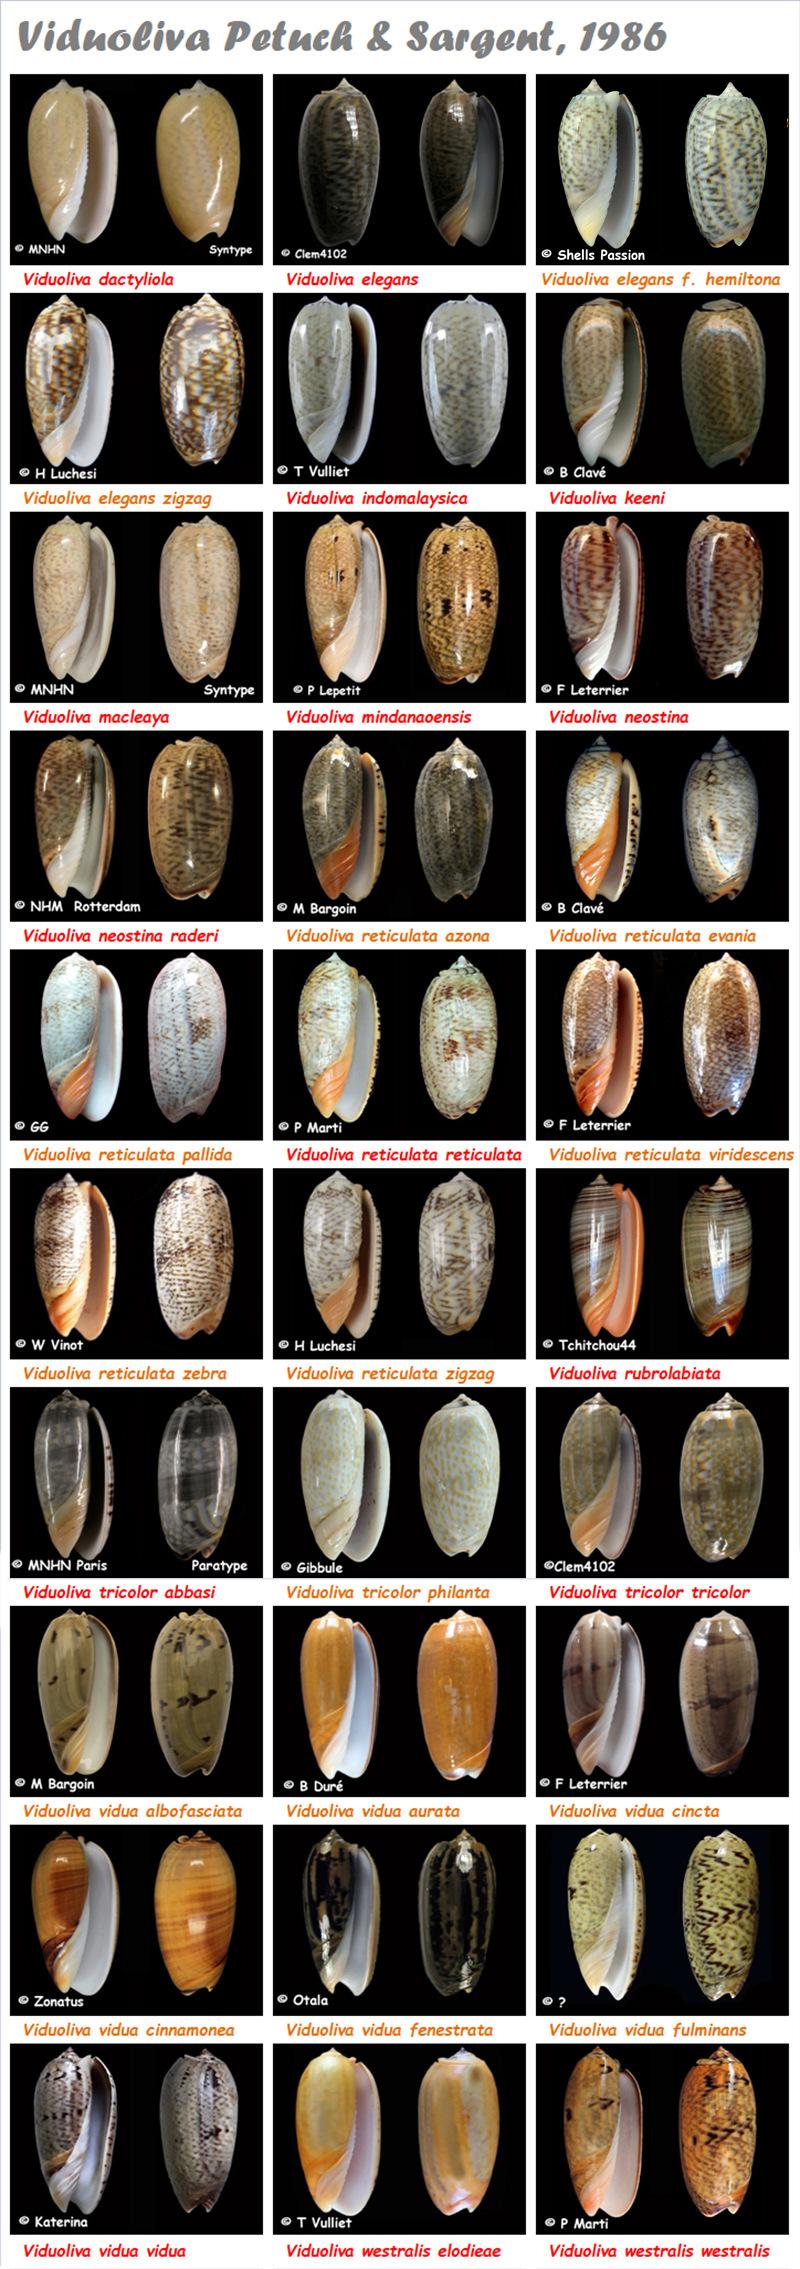 Olividae Viduoliva - Le genre, les espèces, la planche Viduol12